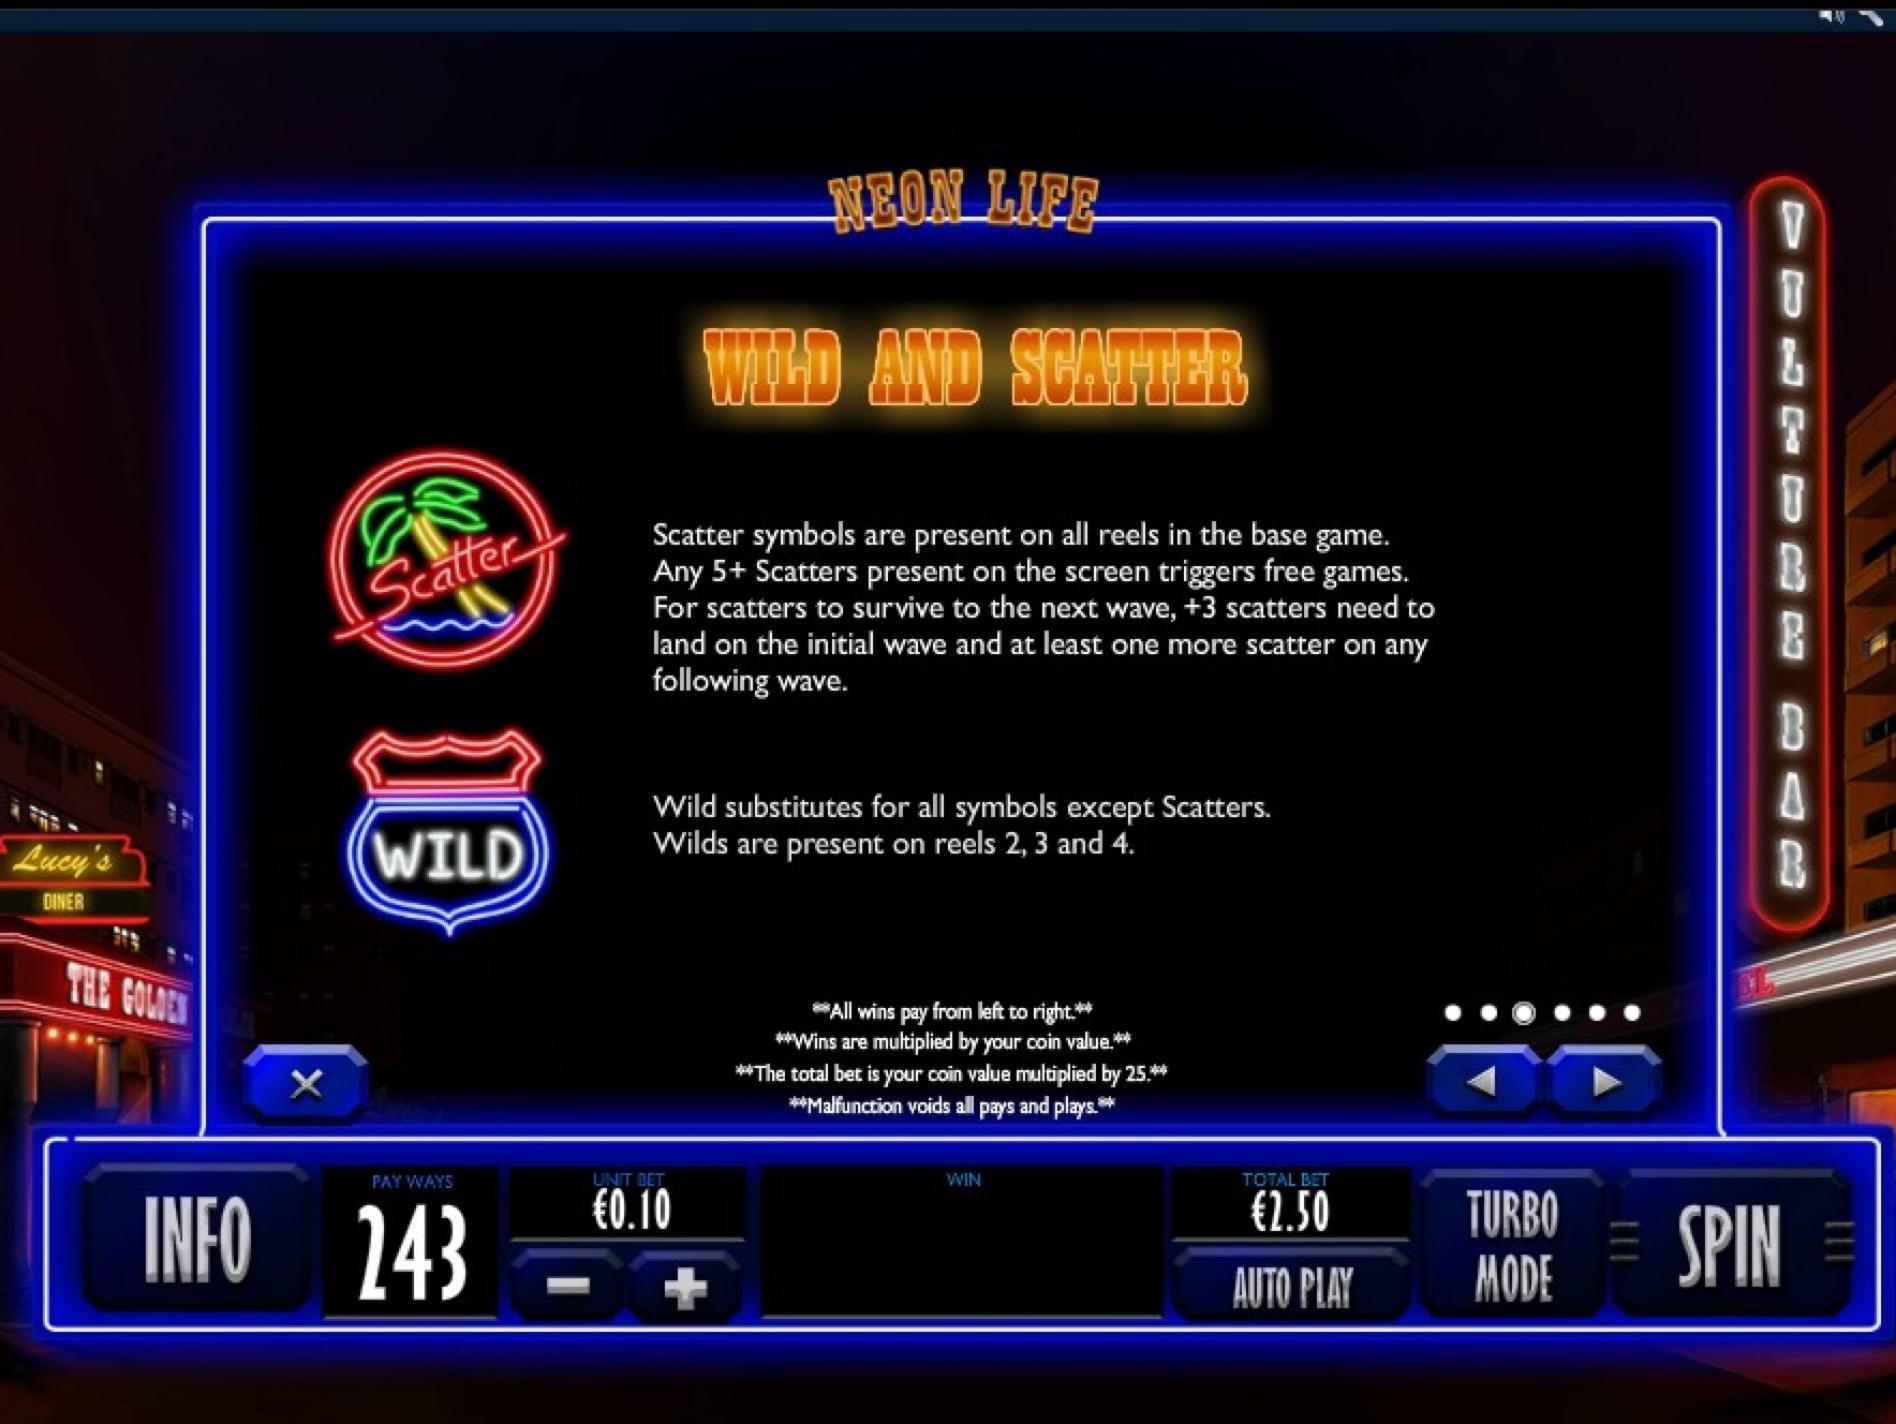 $485 Casino chip at William Hill Casino